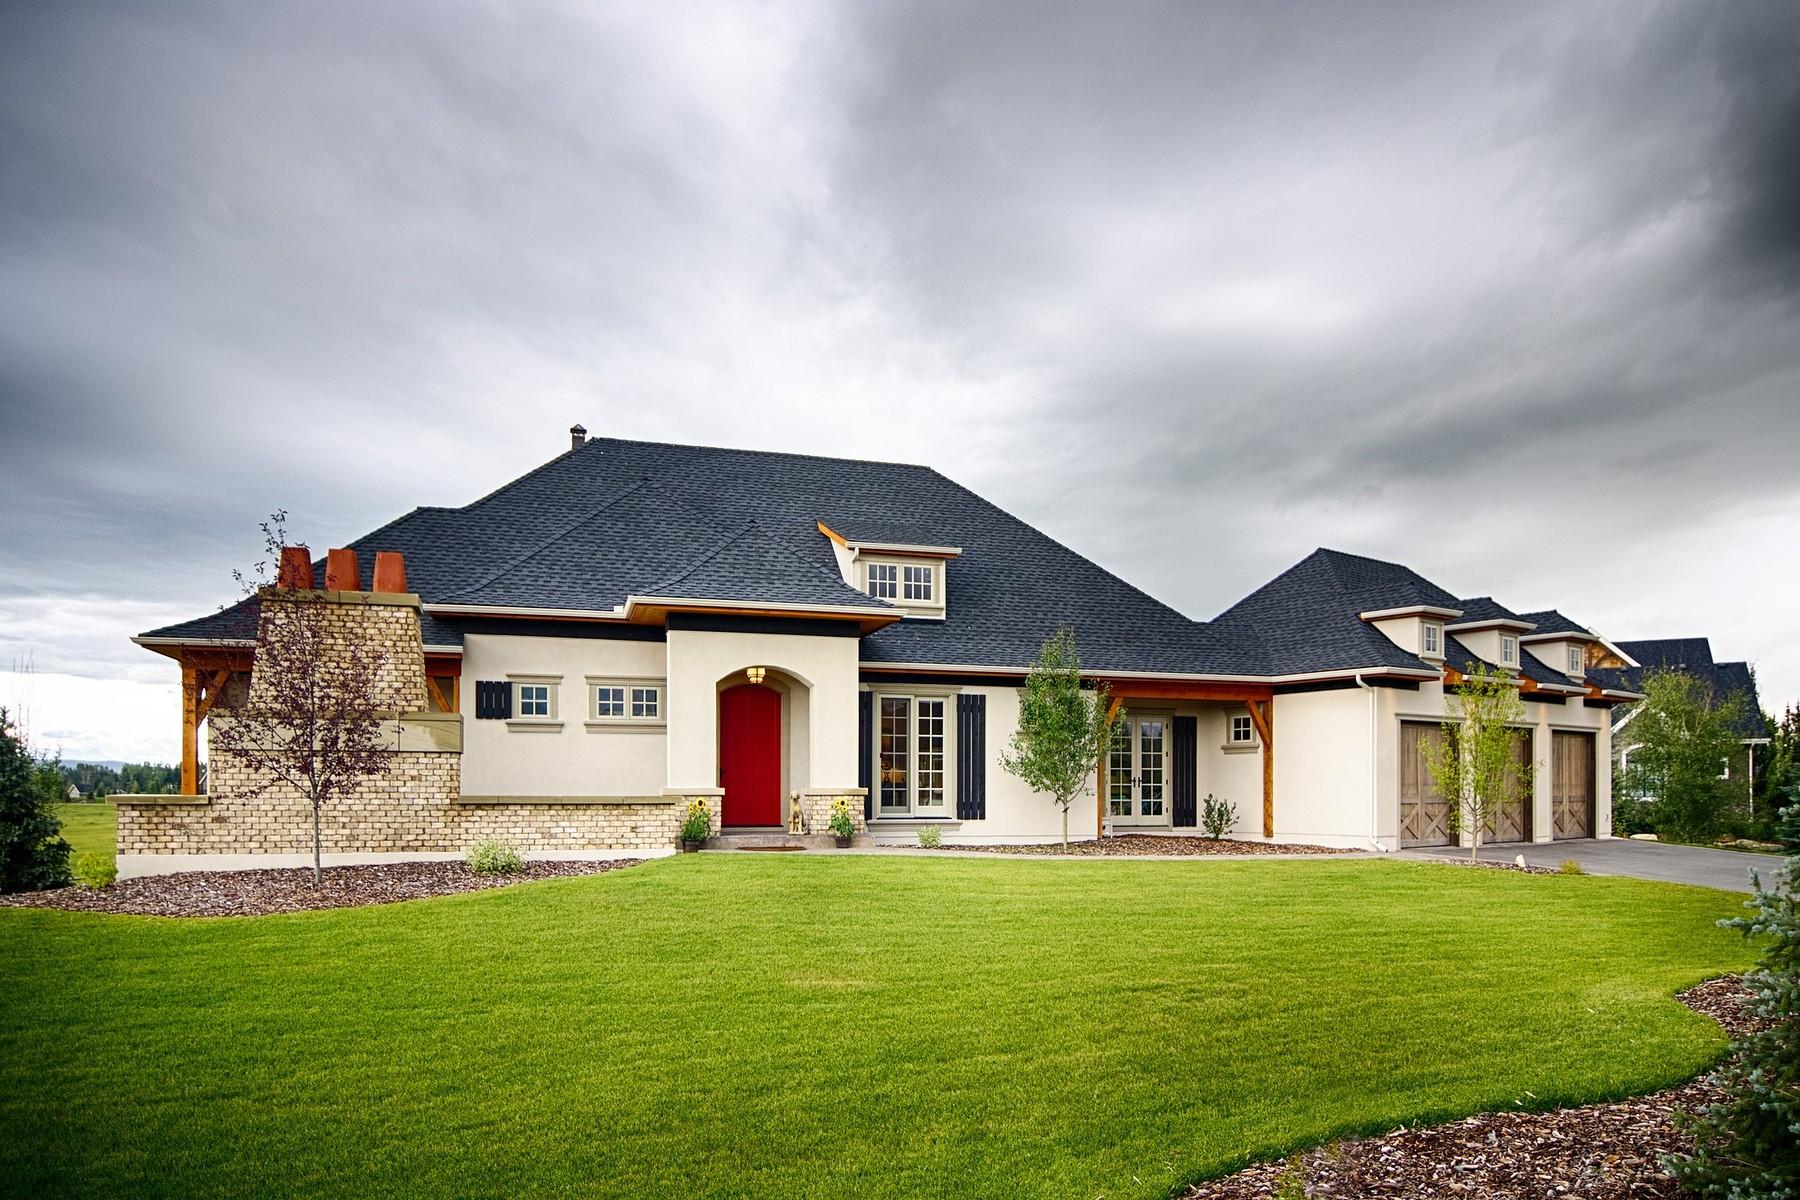 Single Family Home for Sale at 113 Mackenas Lane 113 Mackenas Ln Calgary, Alberta T3Z 3C9 Canada